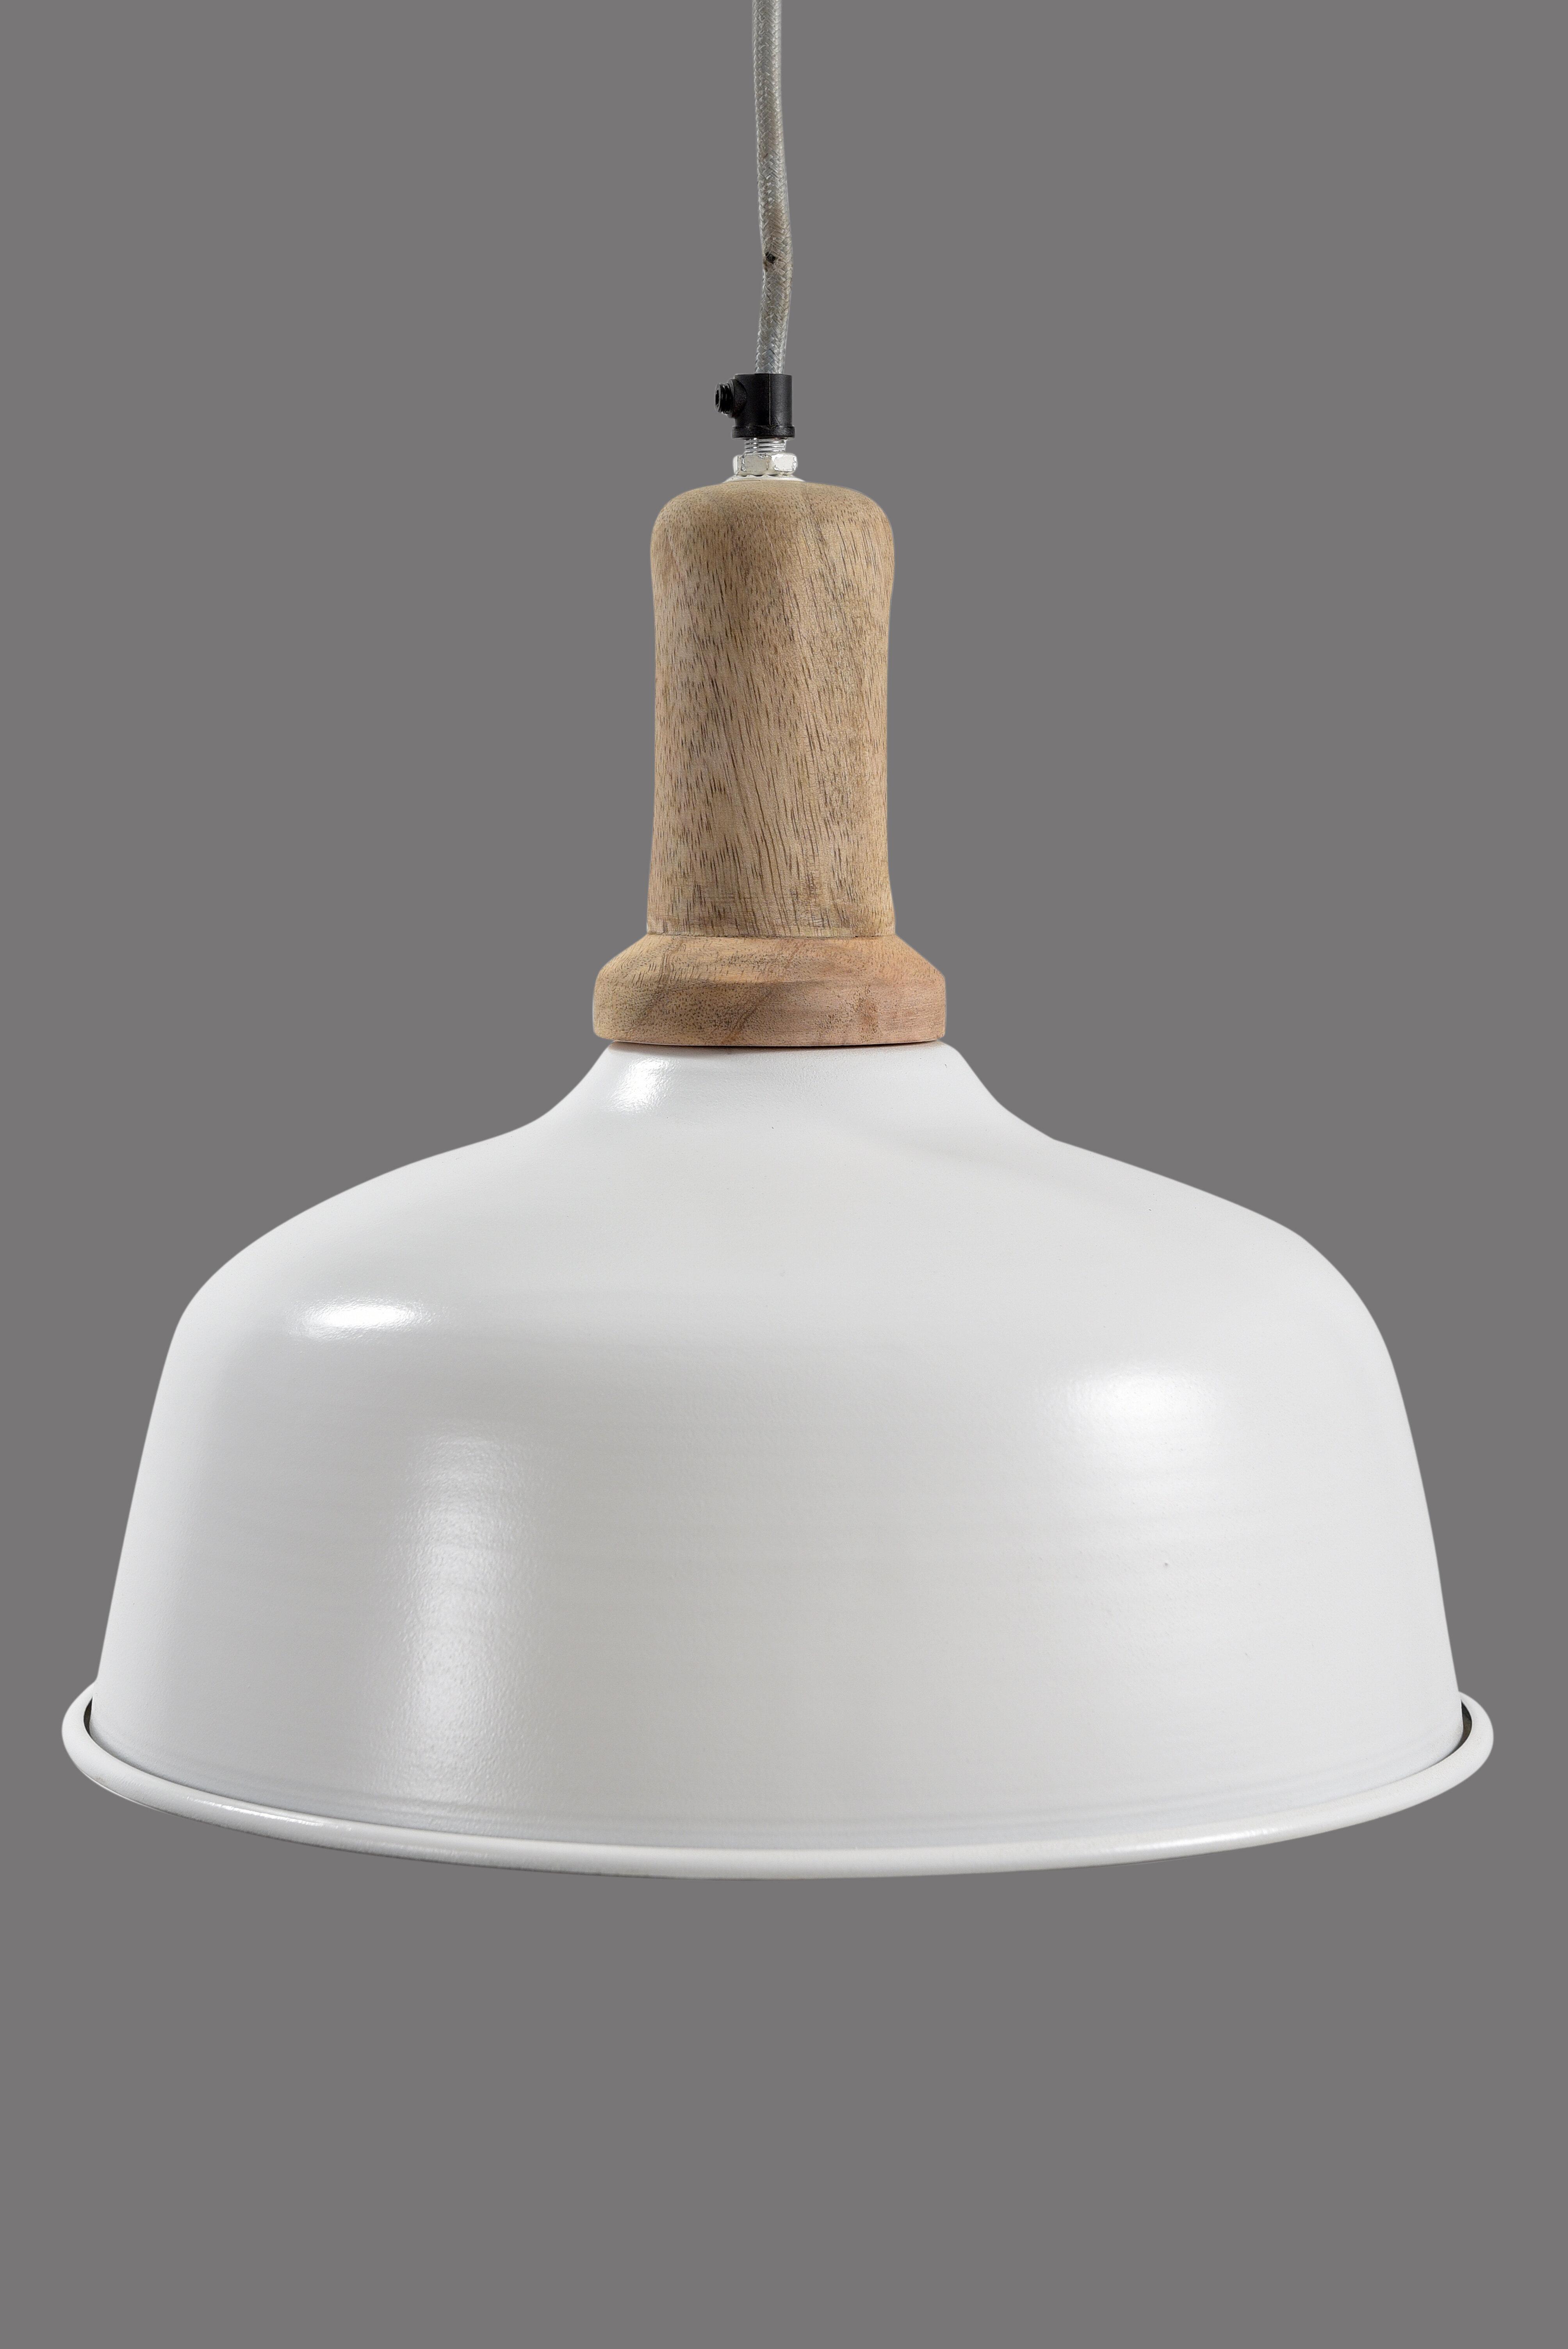 Glenam 1 Light Single Dome Pendant Inside Gattis 1 Light Dome Pendants (View 9 of 30)